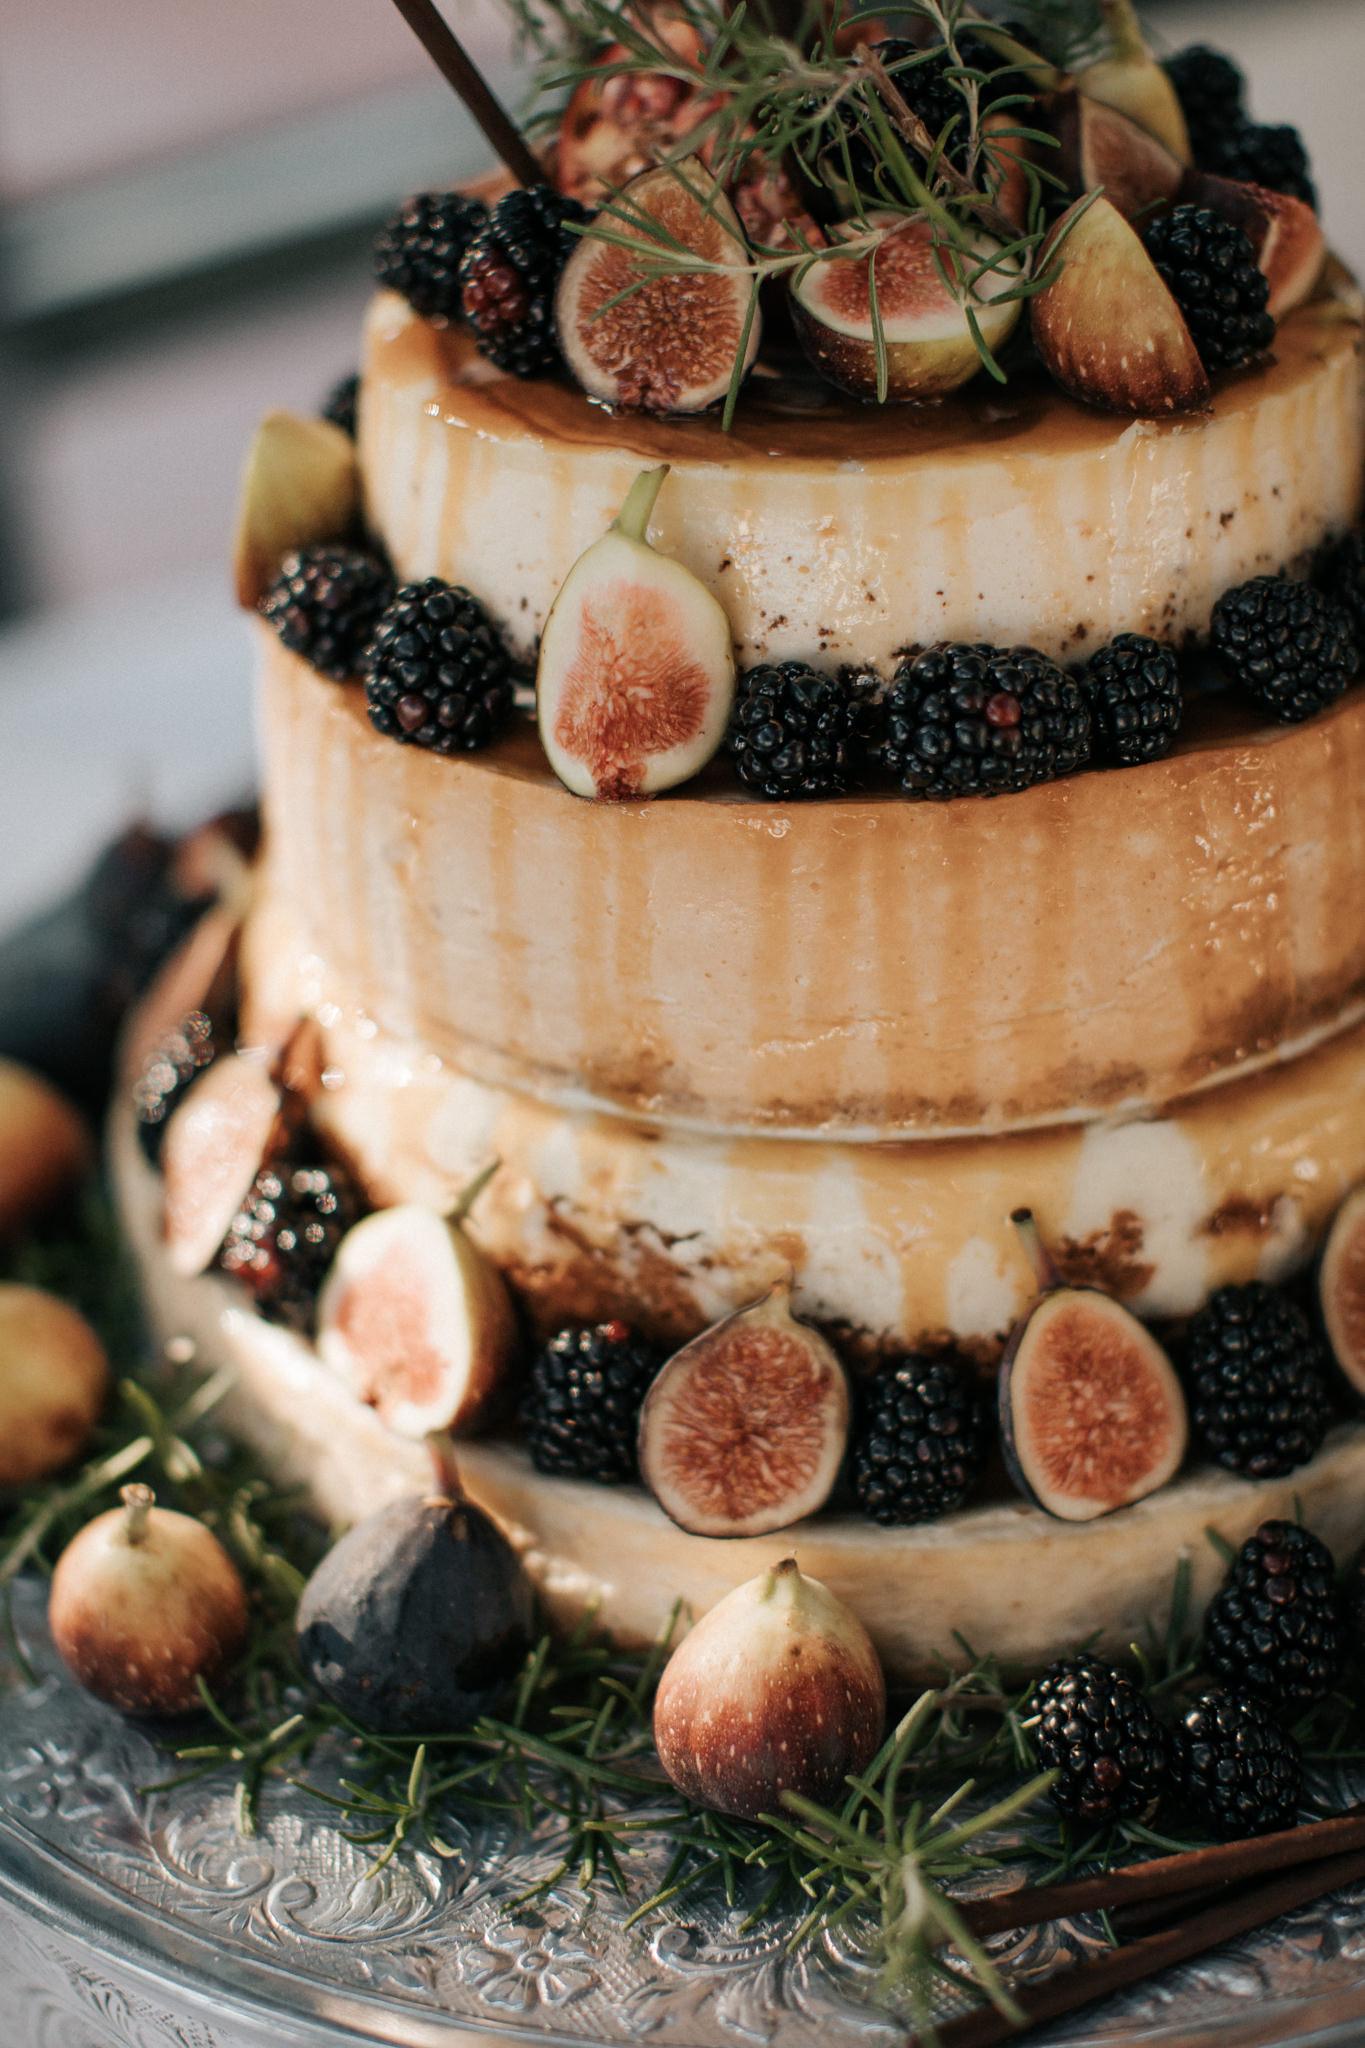 cassie-cook-photography-chattanooga-wedding-photographer-waterhouse-pavillon-adventurous-wedding-unique-fig-wedding-cake